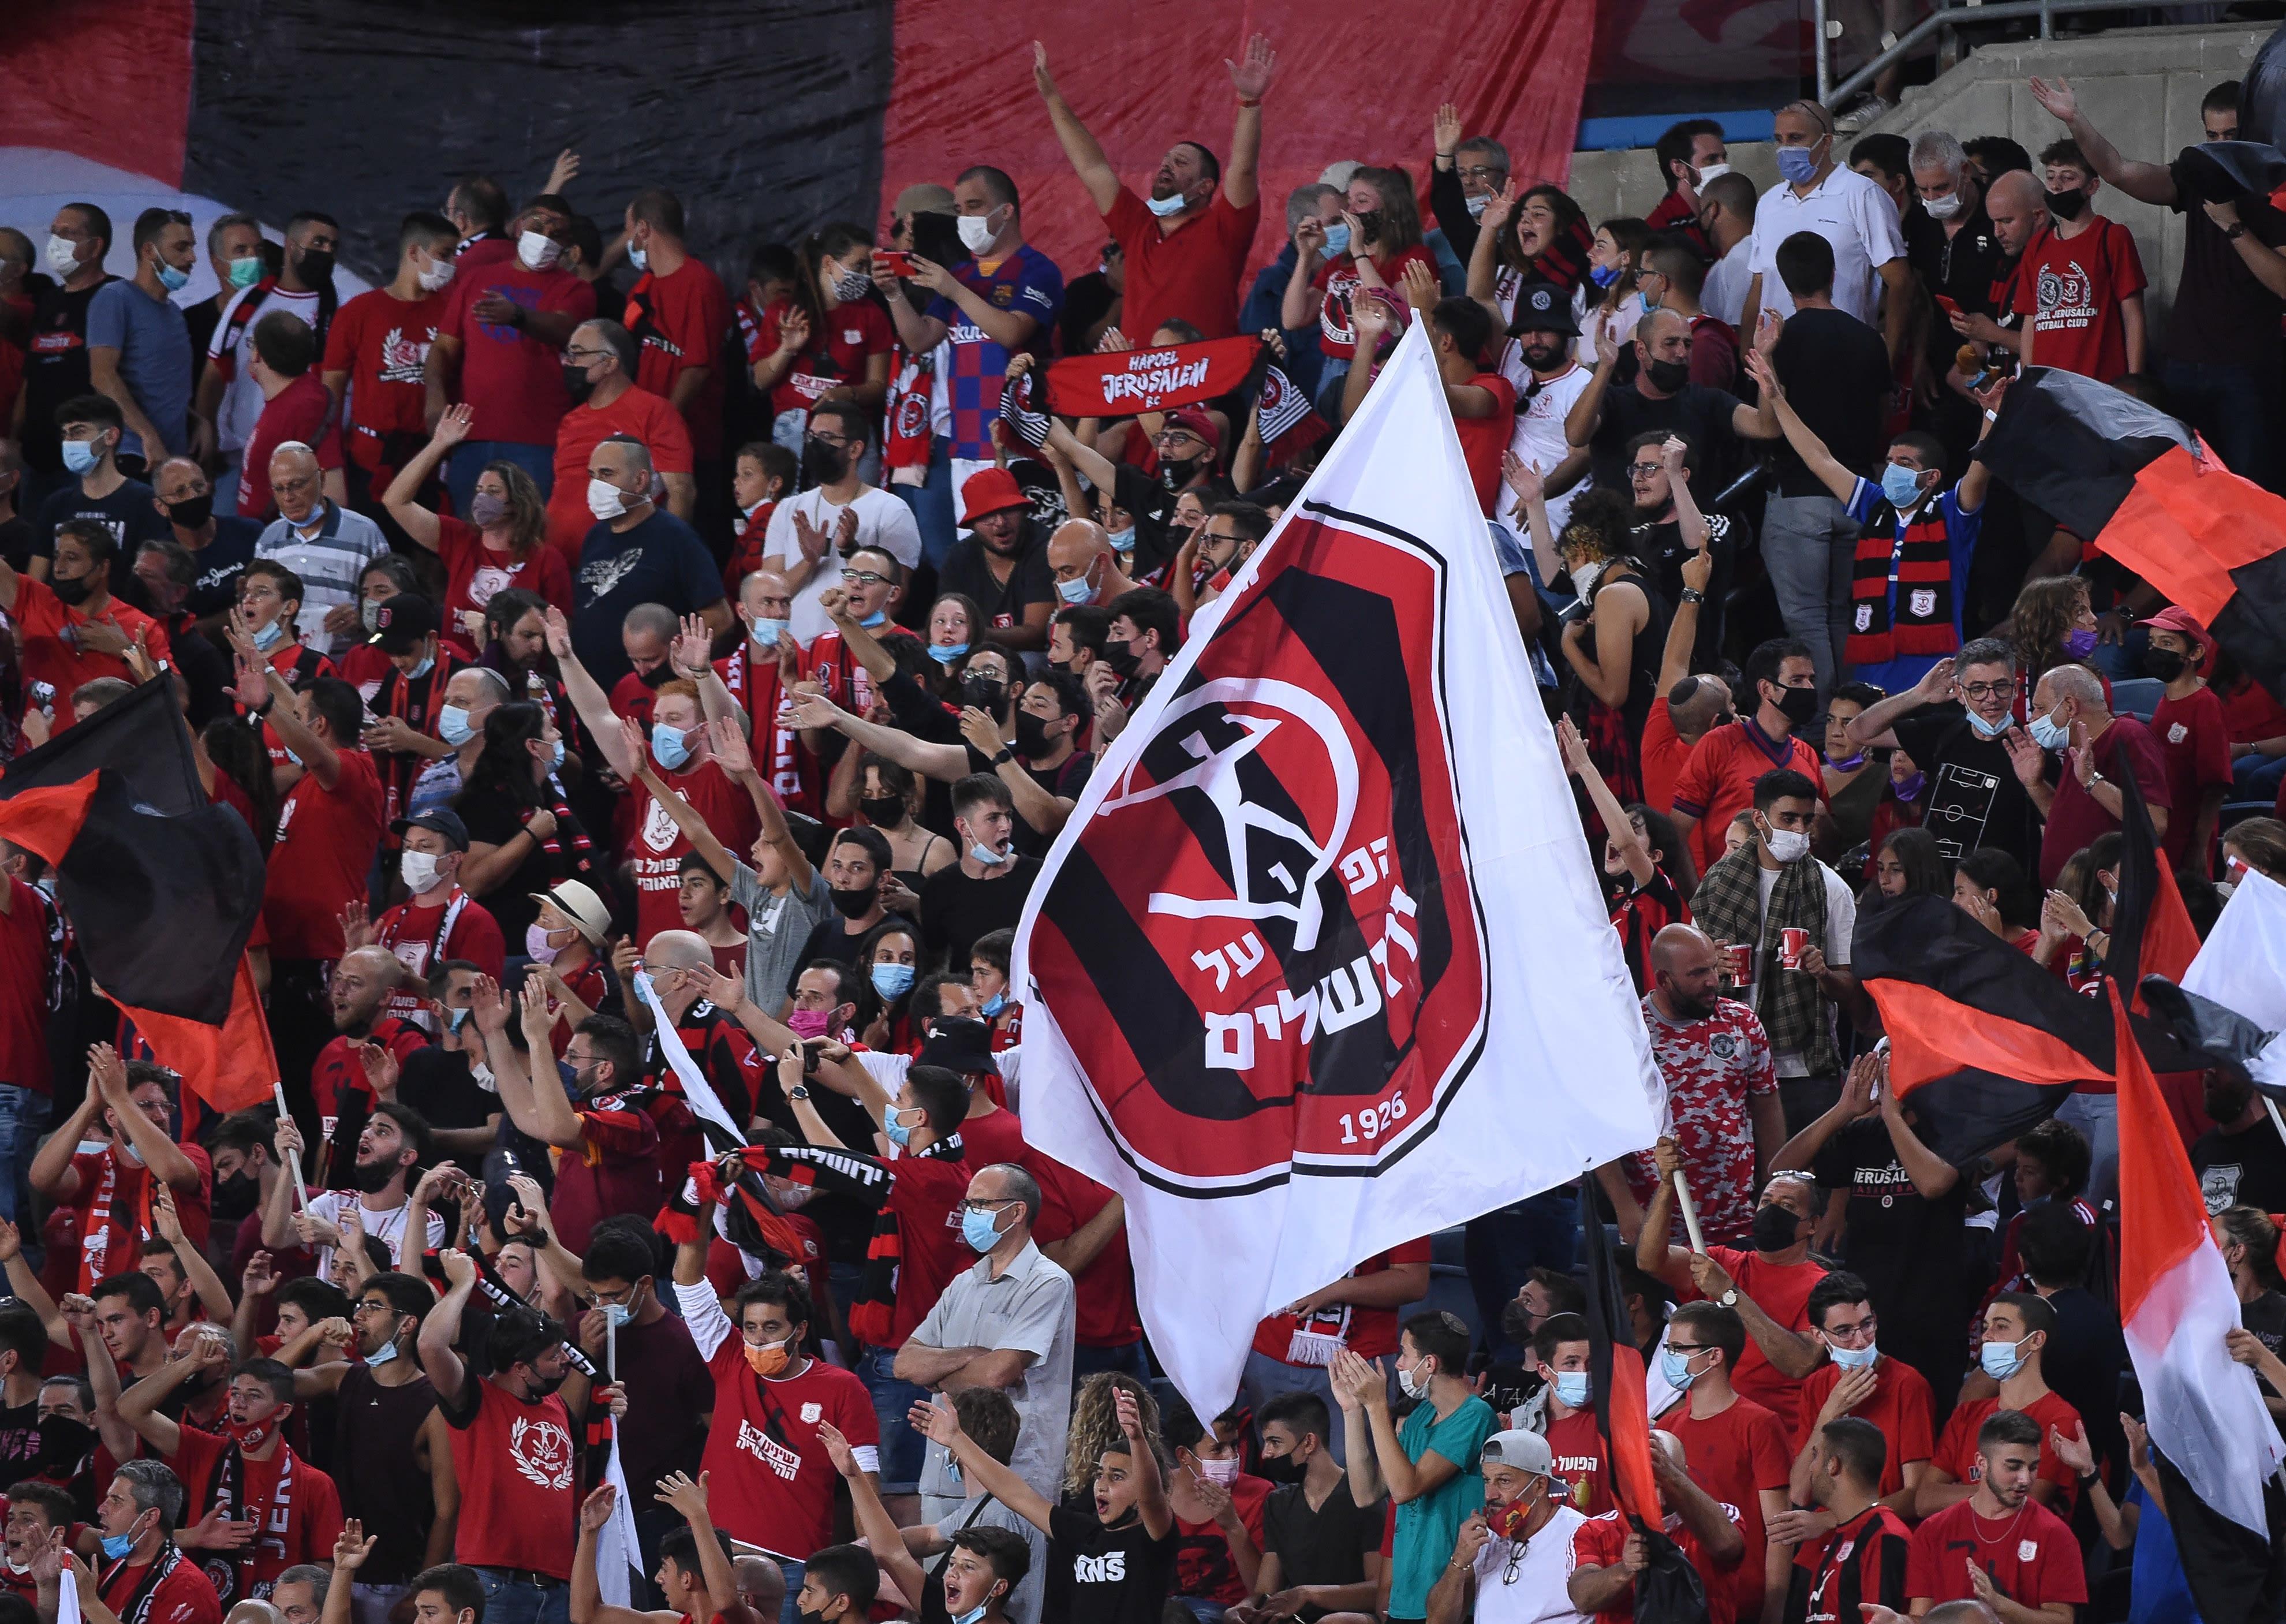 Hapoel Jerusalem football fans